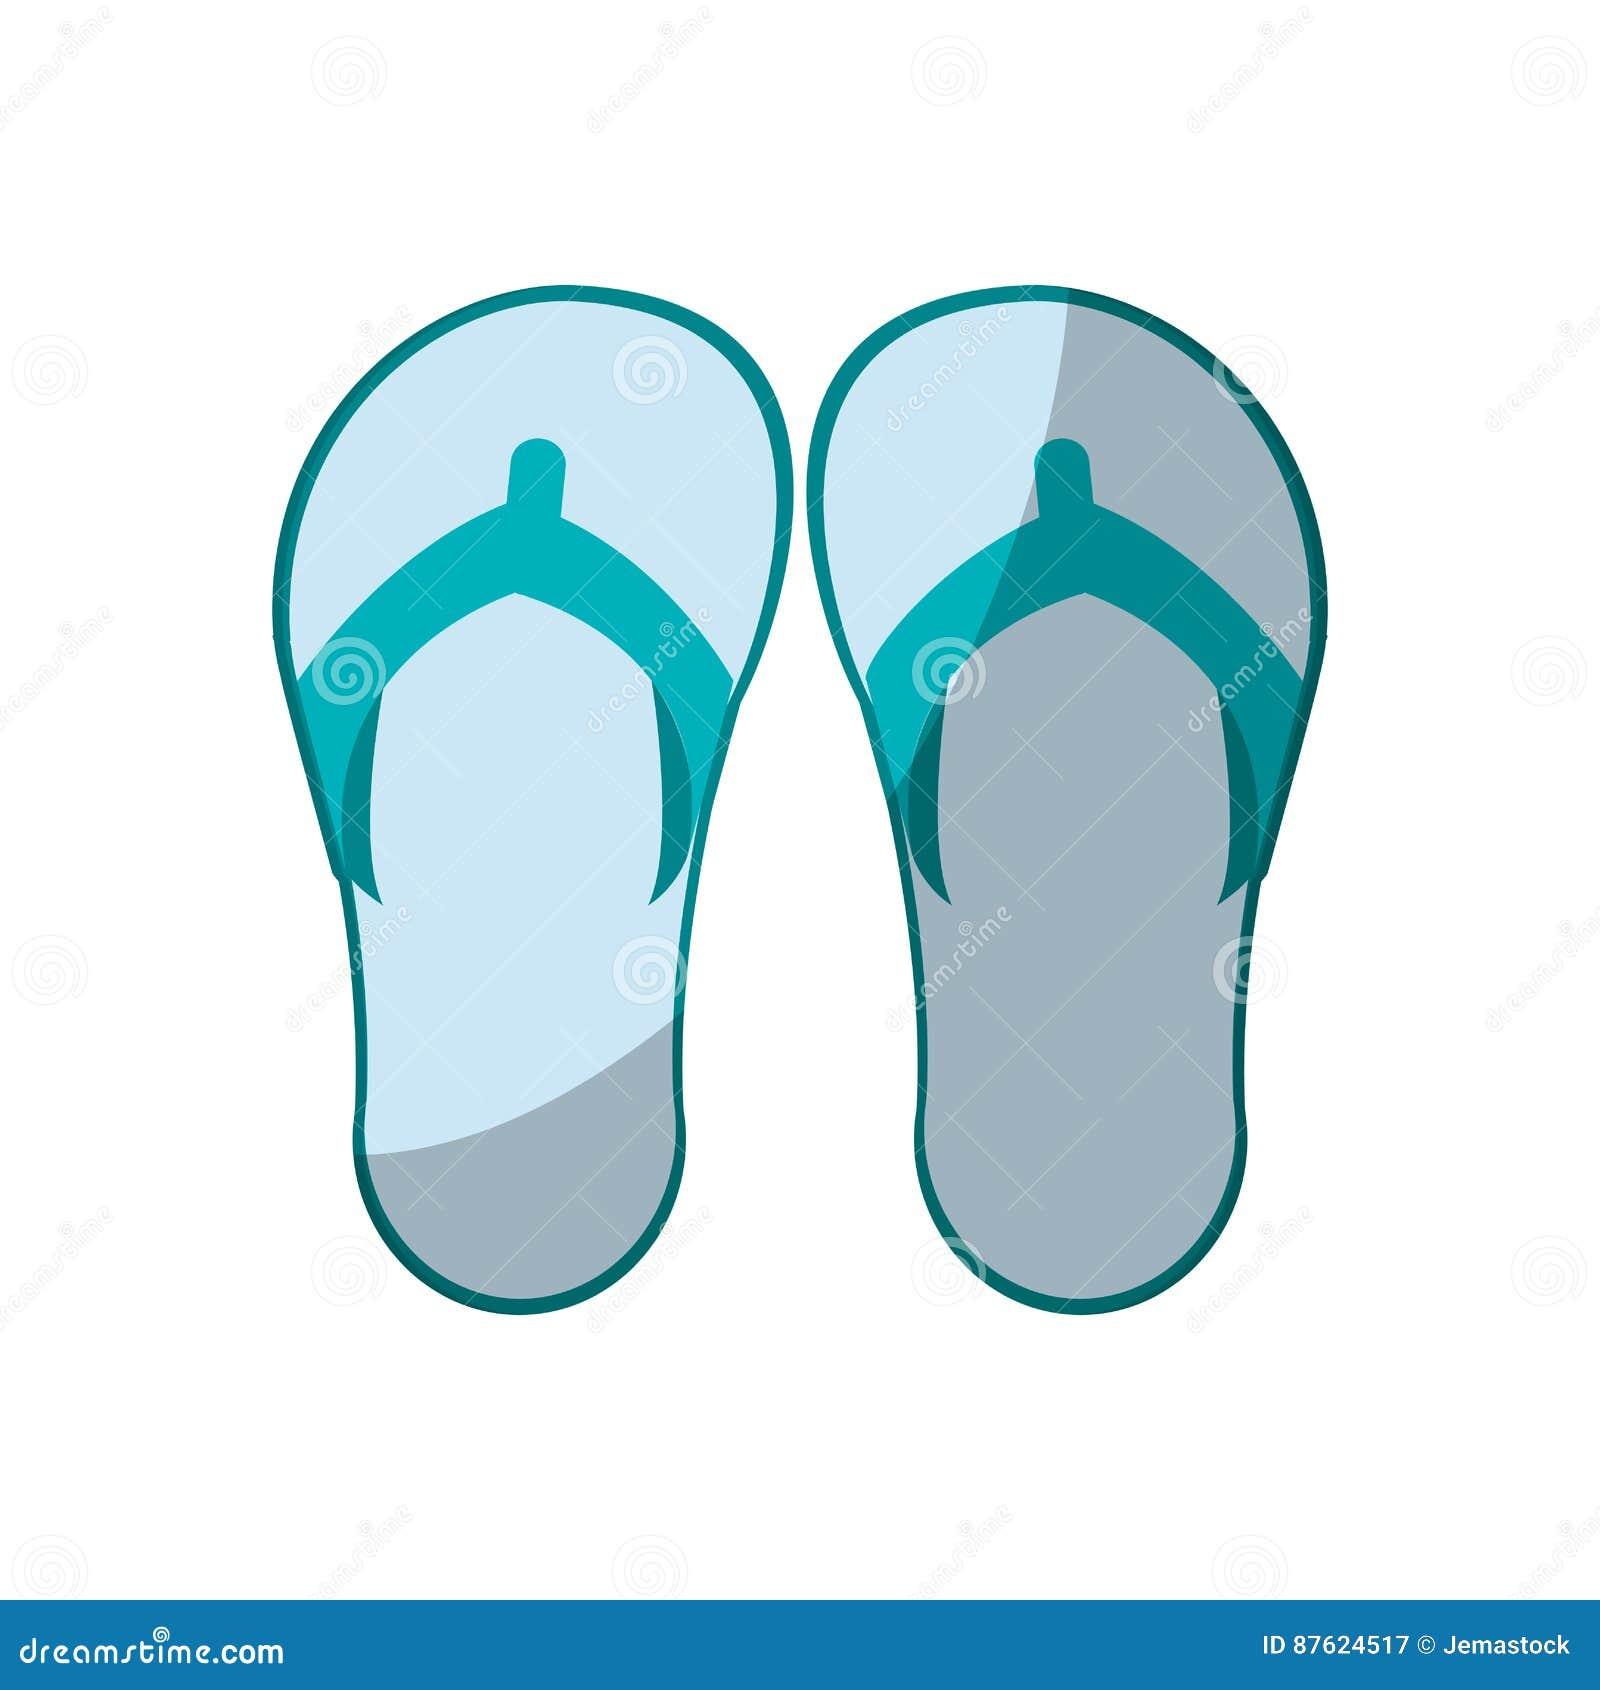 7f55cd203947 Flip flops icon over white background. colorful design. vector illustration